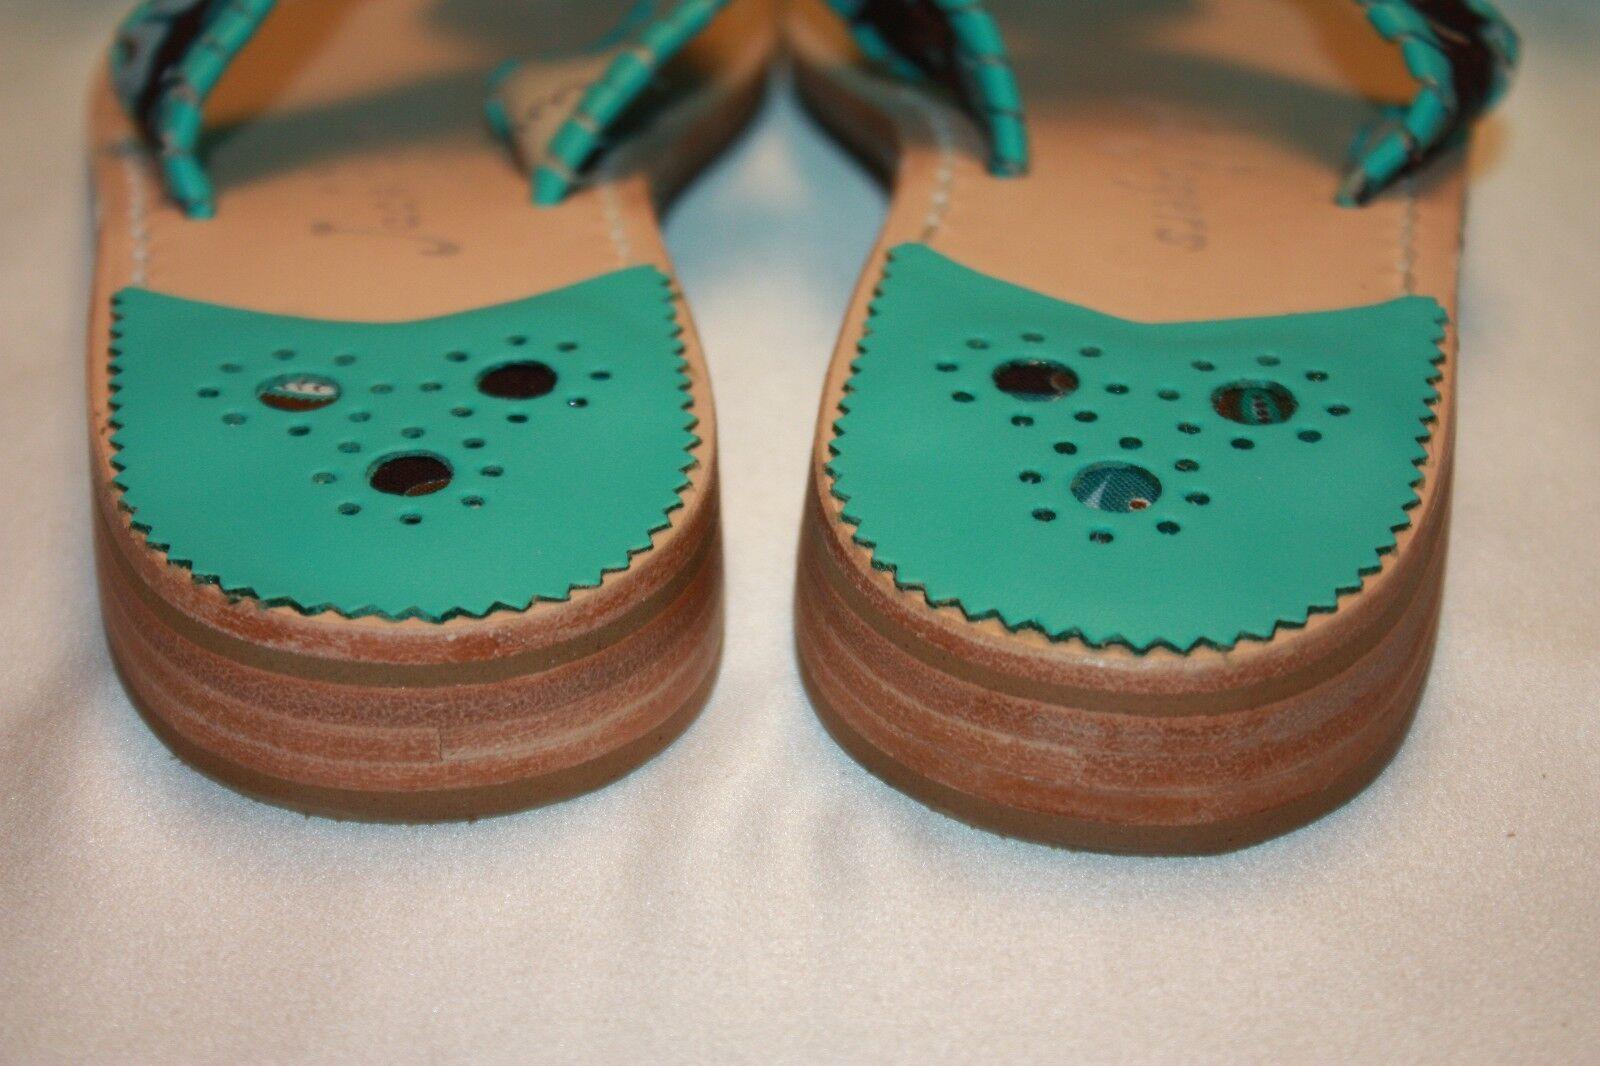 NEW! NIB! JACK ROGERS Peacock Brown Printed NAVAJO 6 Flip Flop Sandals Sz 6 NAVAJO 6.5 4506a2